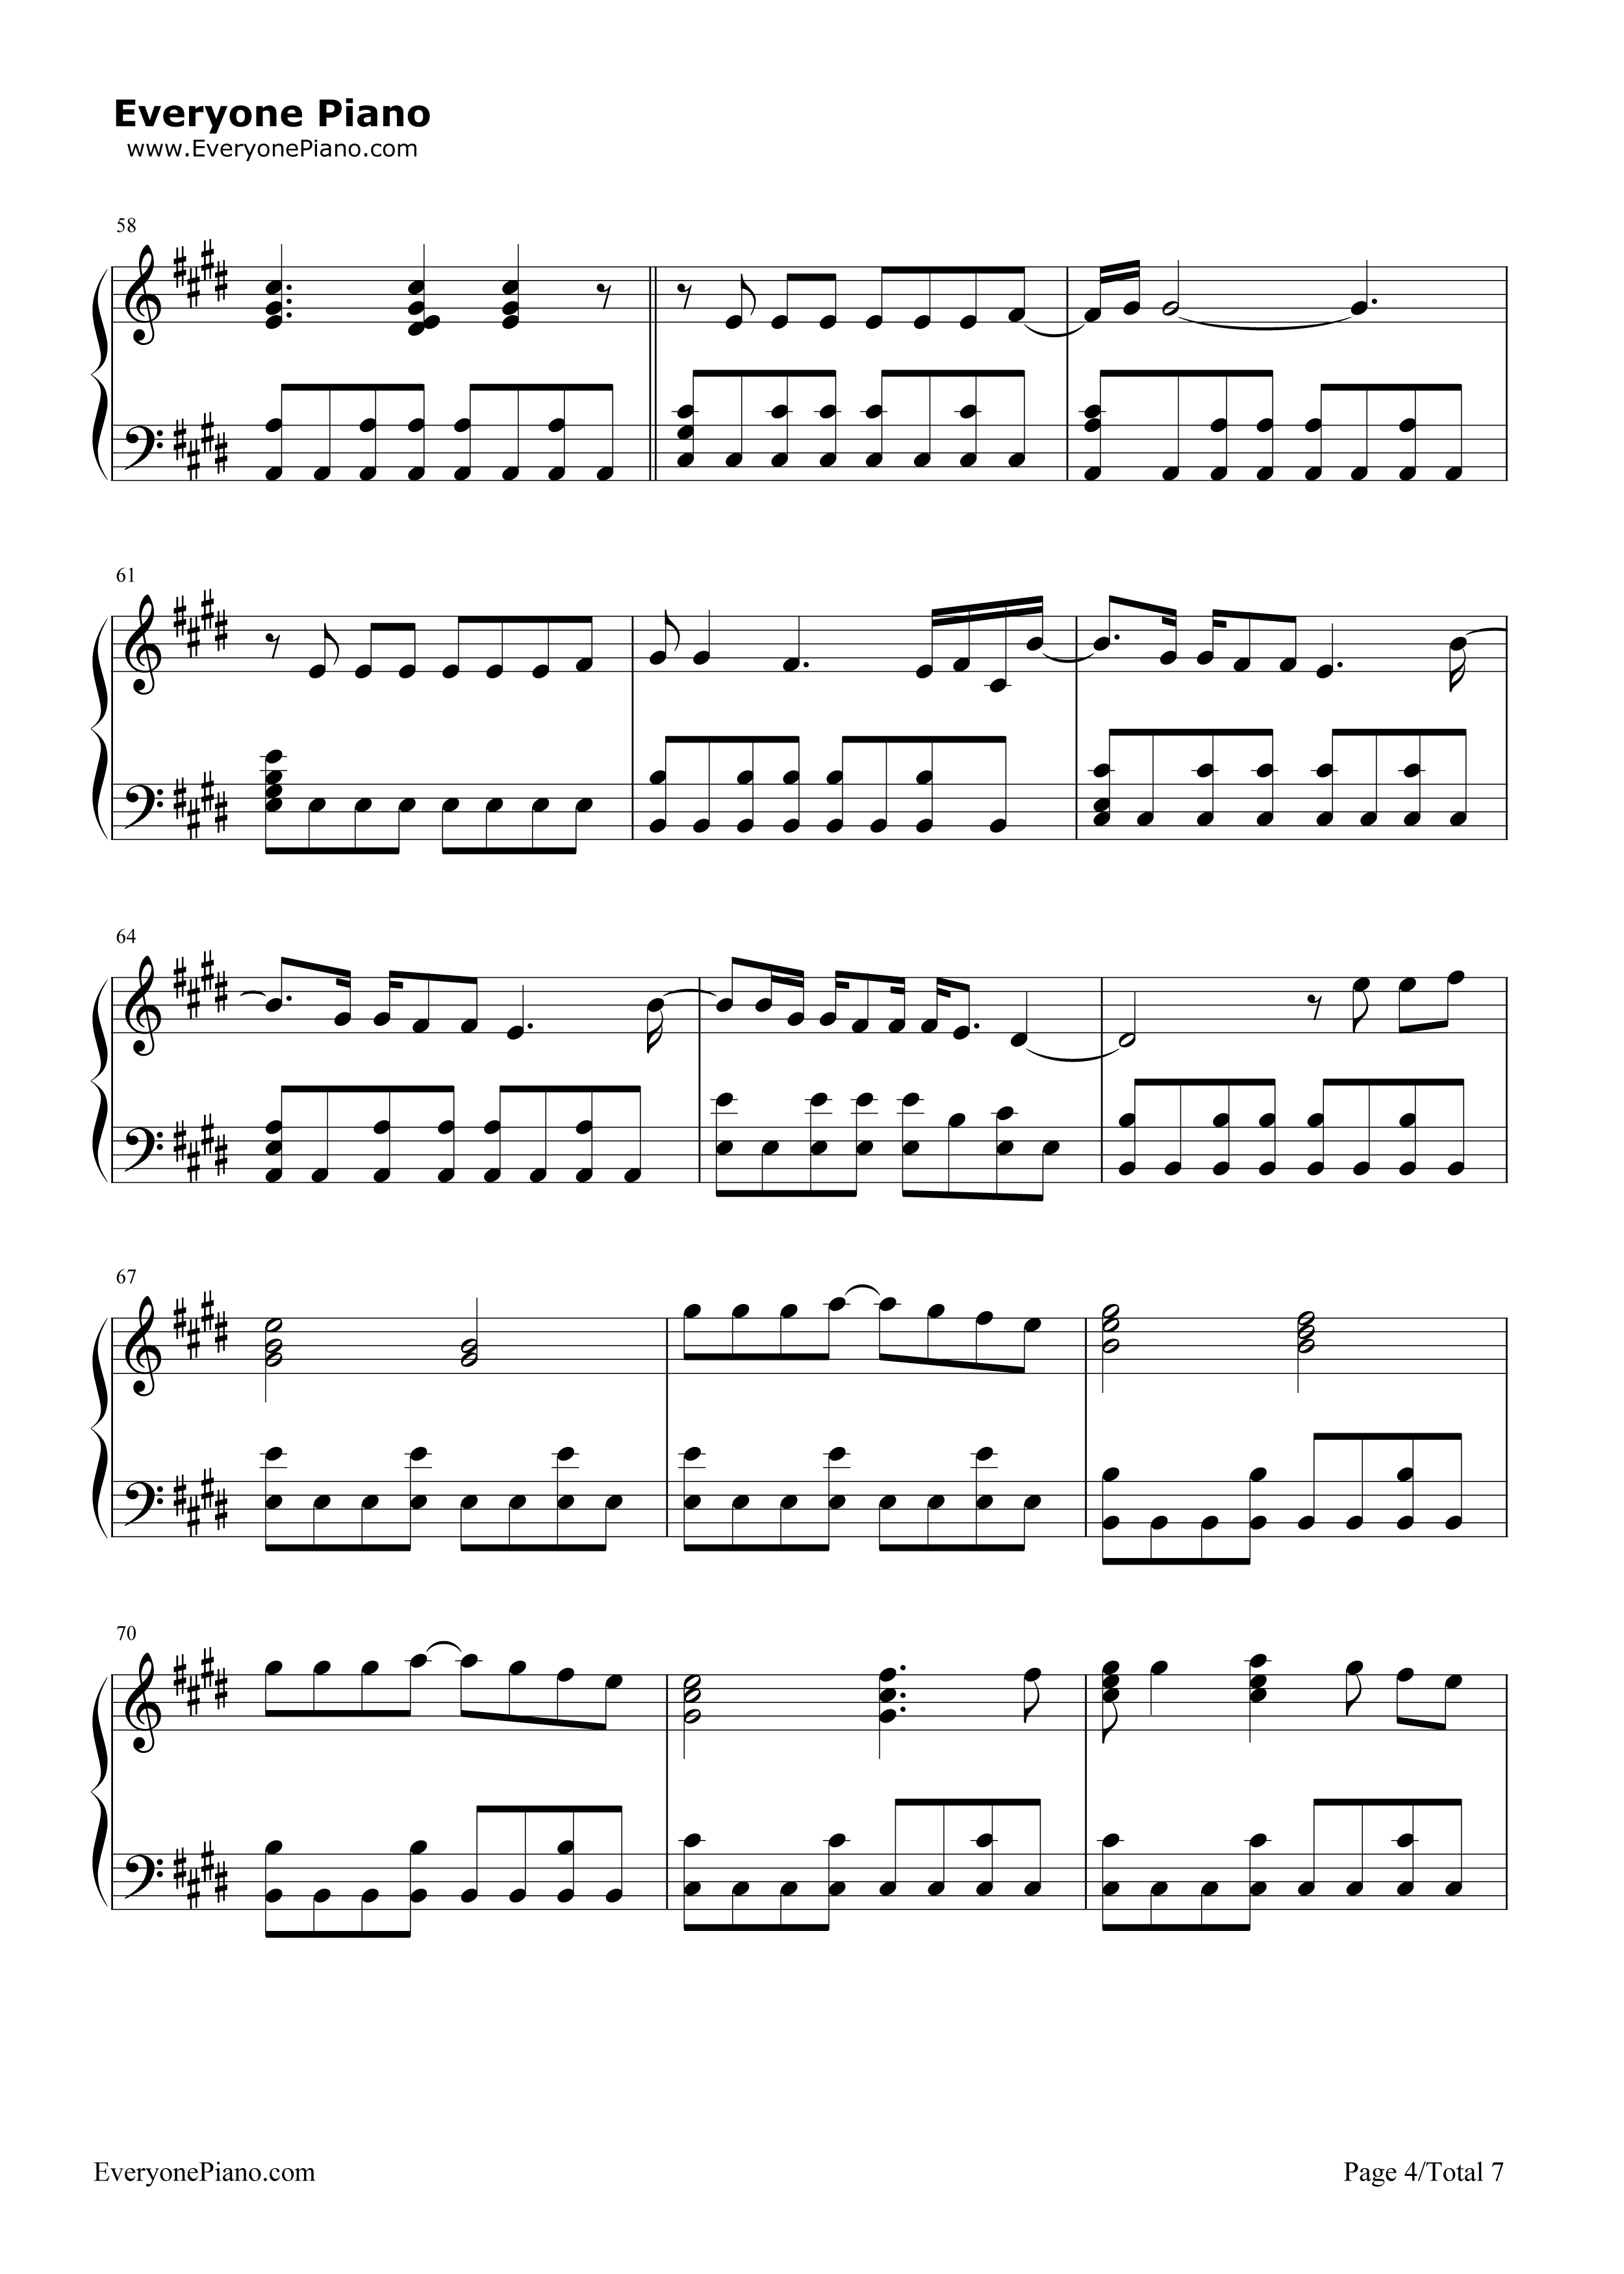 Photograph-Ed Sheeran Stave Preview 4-Free Piano Sheet Music u0026 Piano Chords